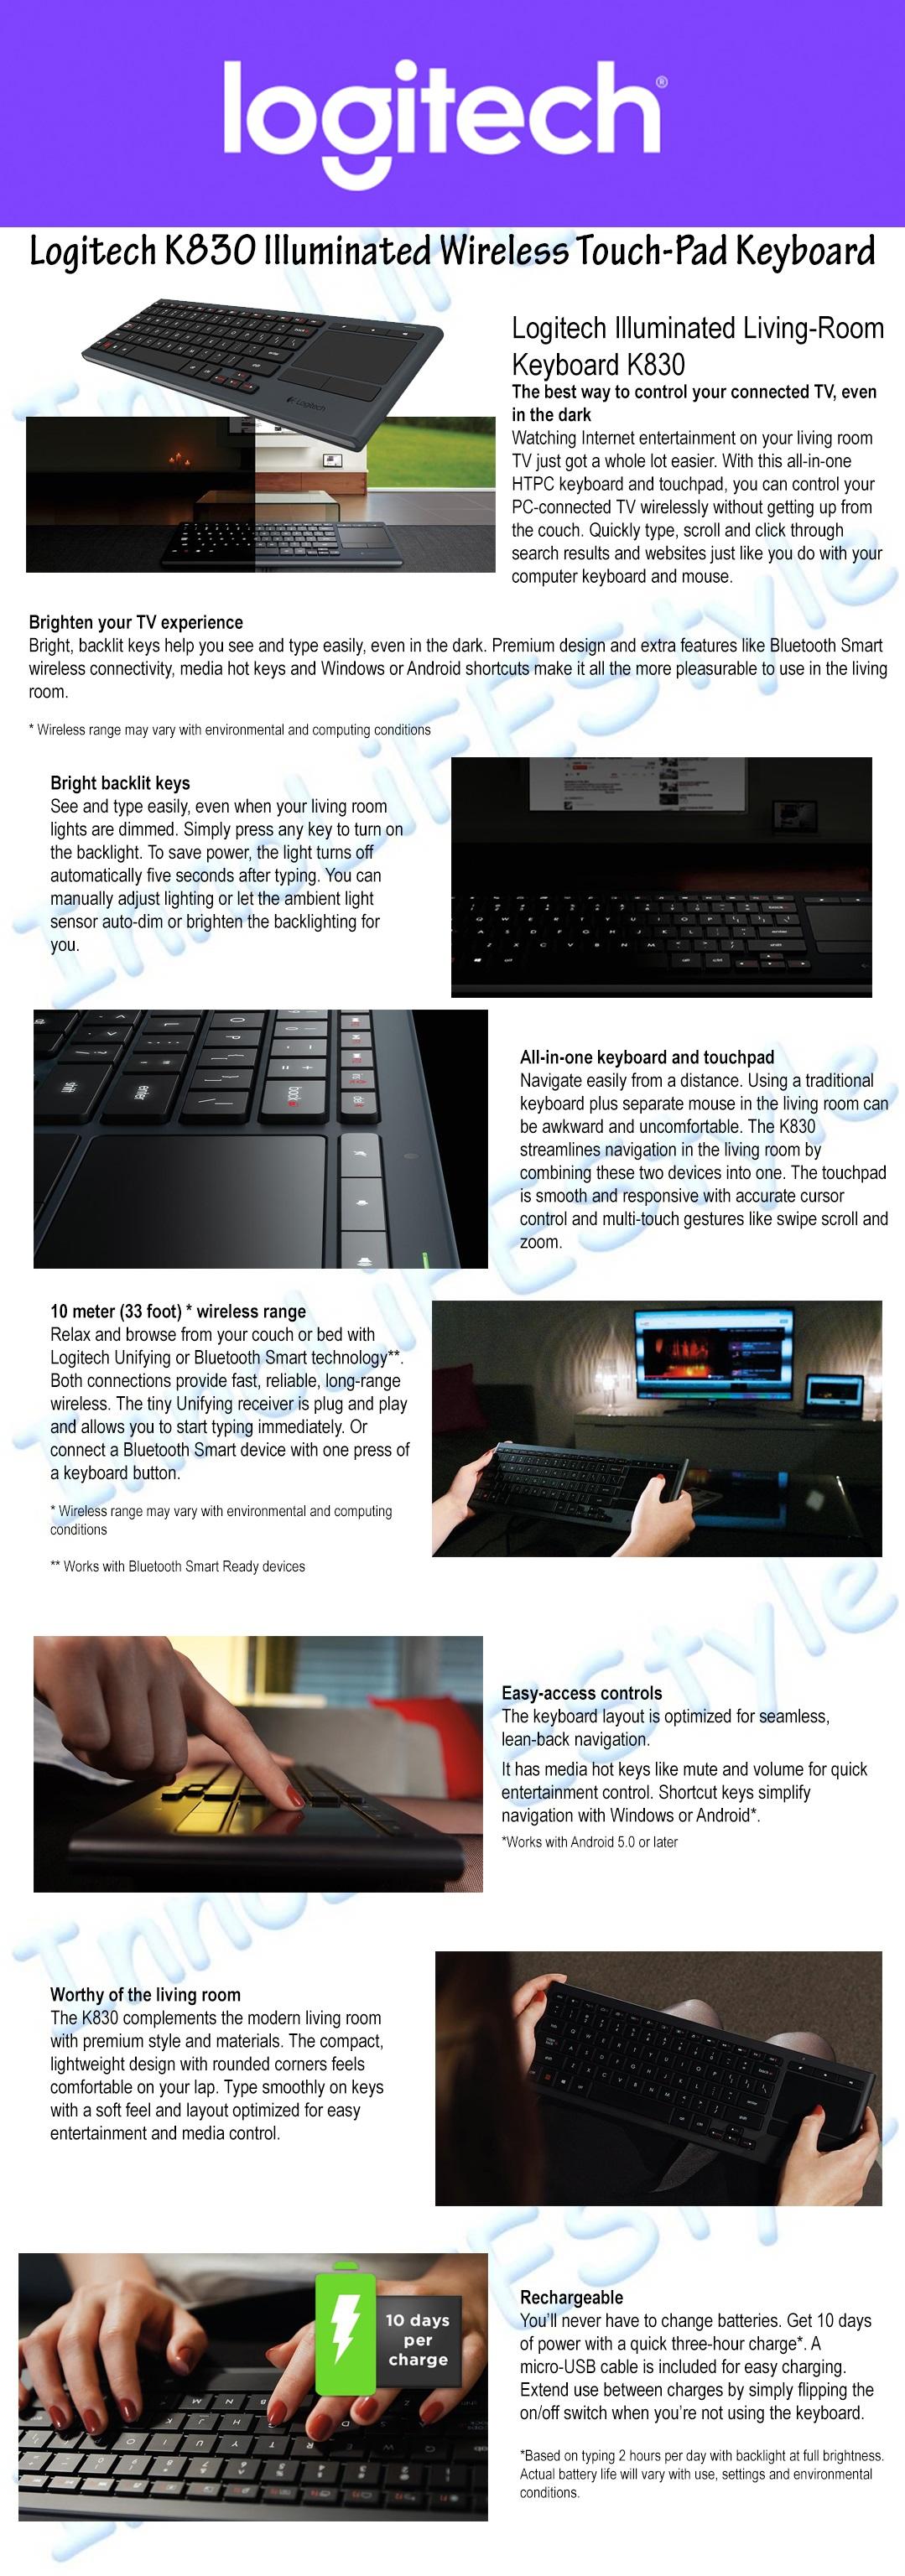 Logitech K830 Illuminated Wireless Living Room Keyboard